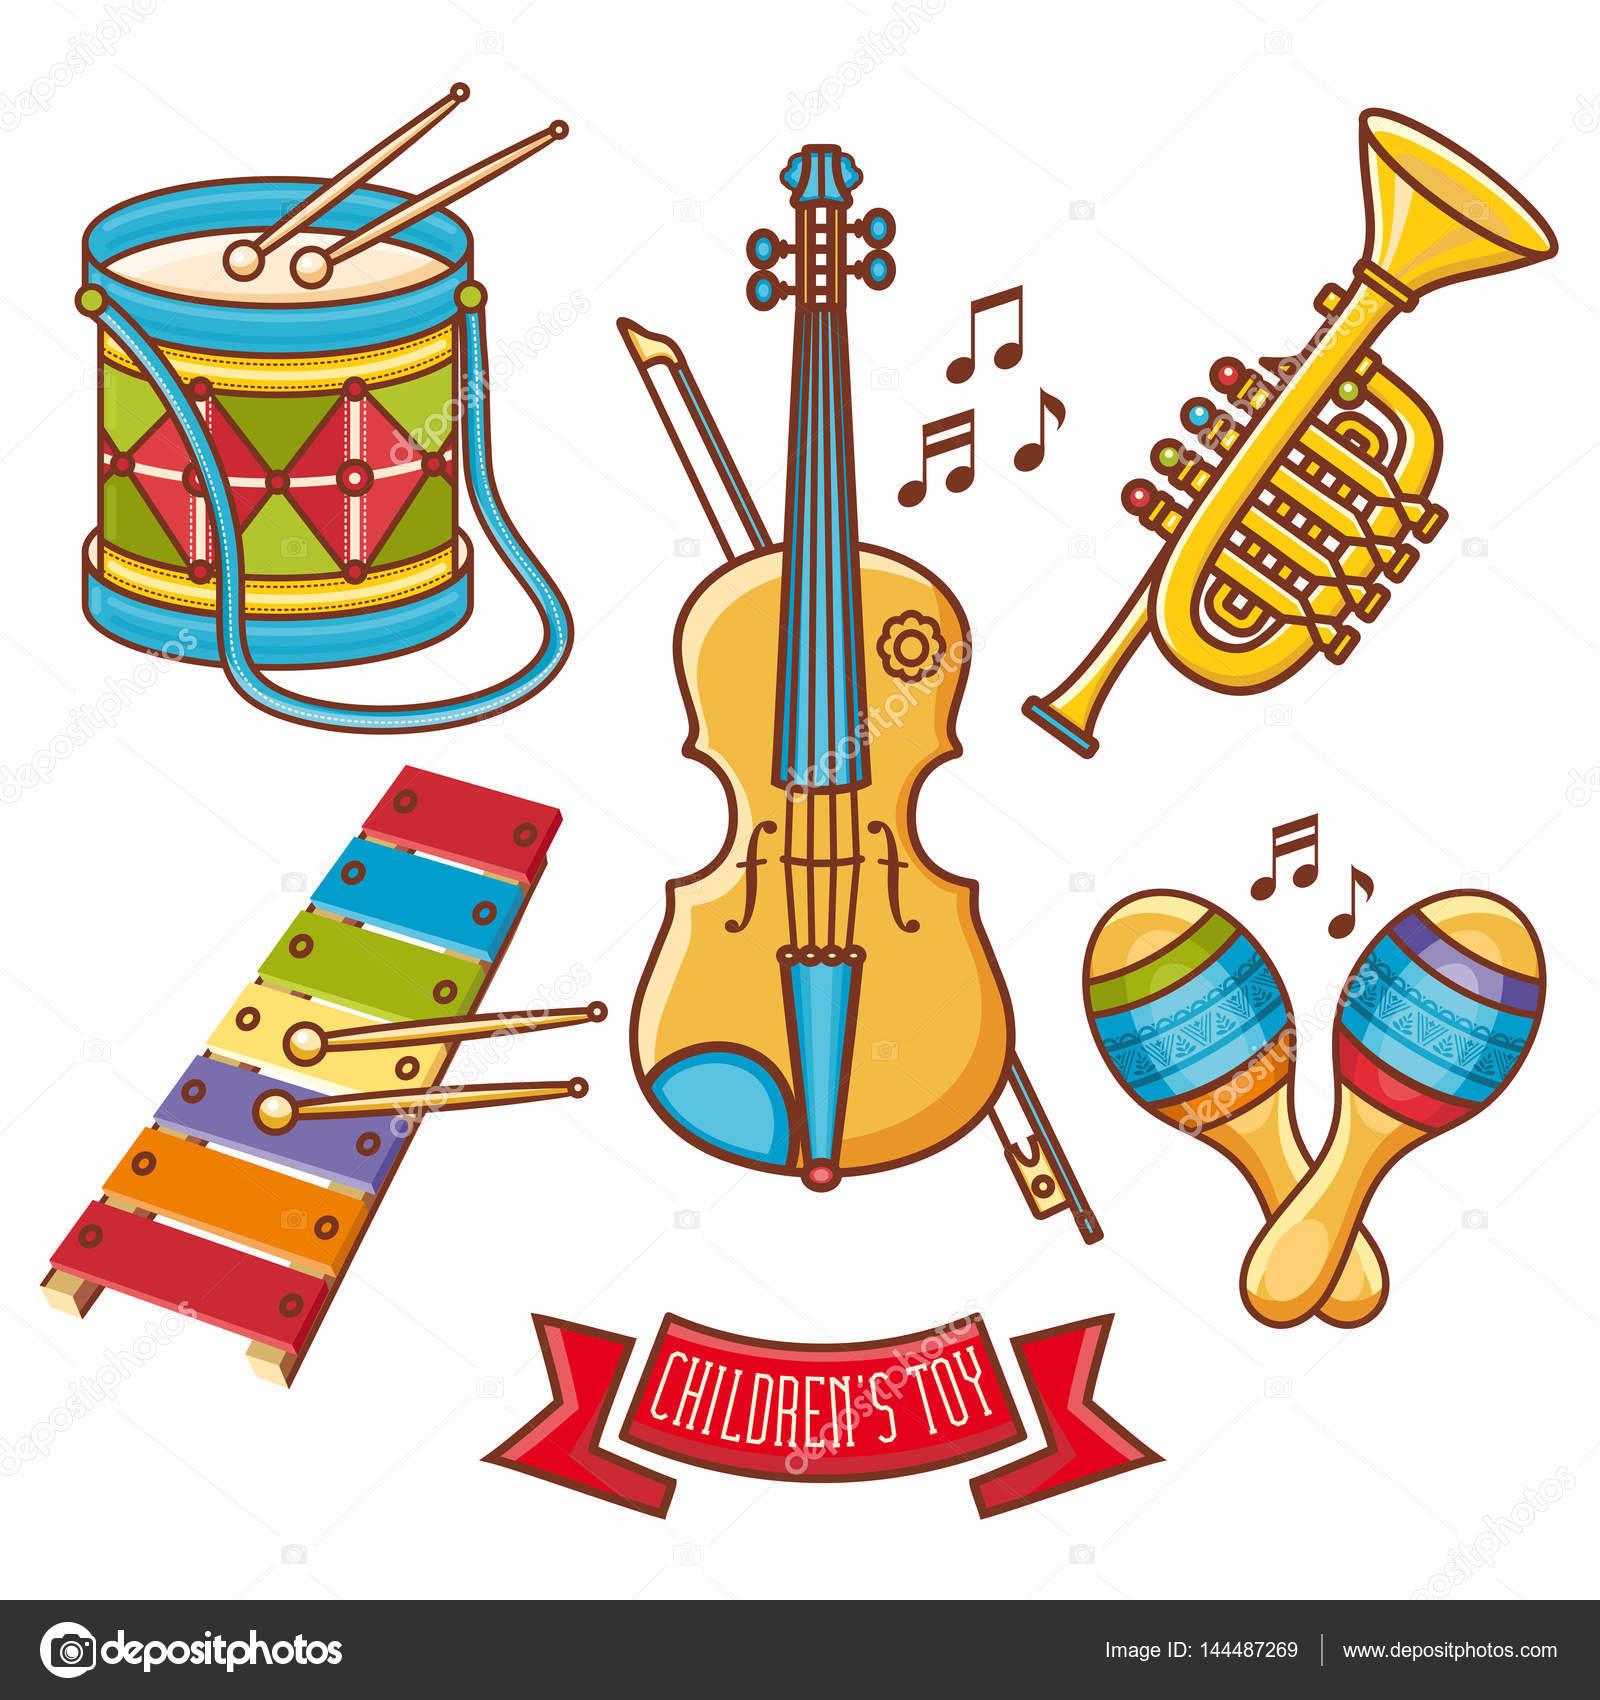 DibujosInstrumentos Musicales Musicales Musicales DibujosInstrumentos Niños DibujosInstrumentos Niños Niños DibujosInstrumentos Musicales 5R34LjqA